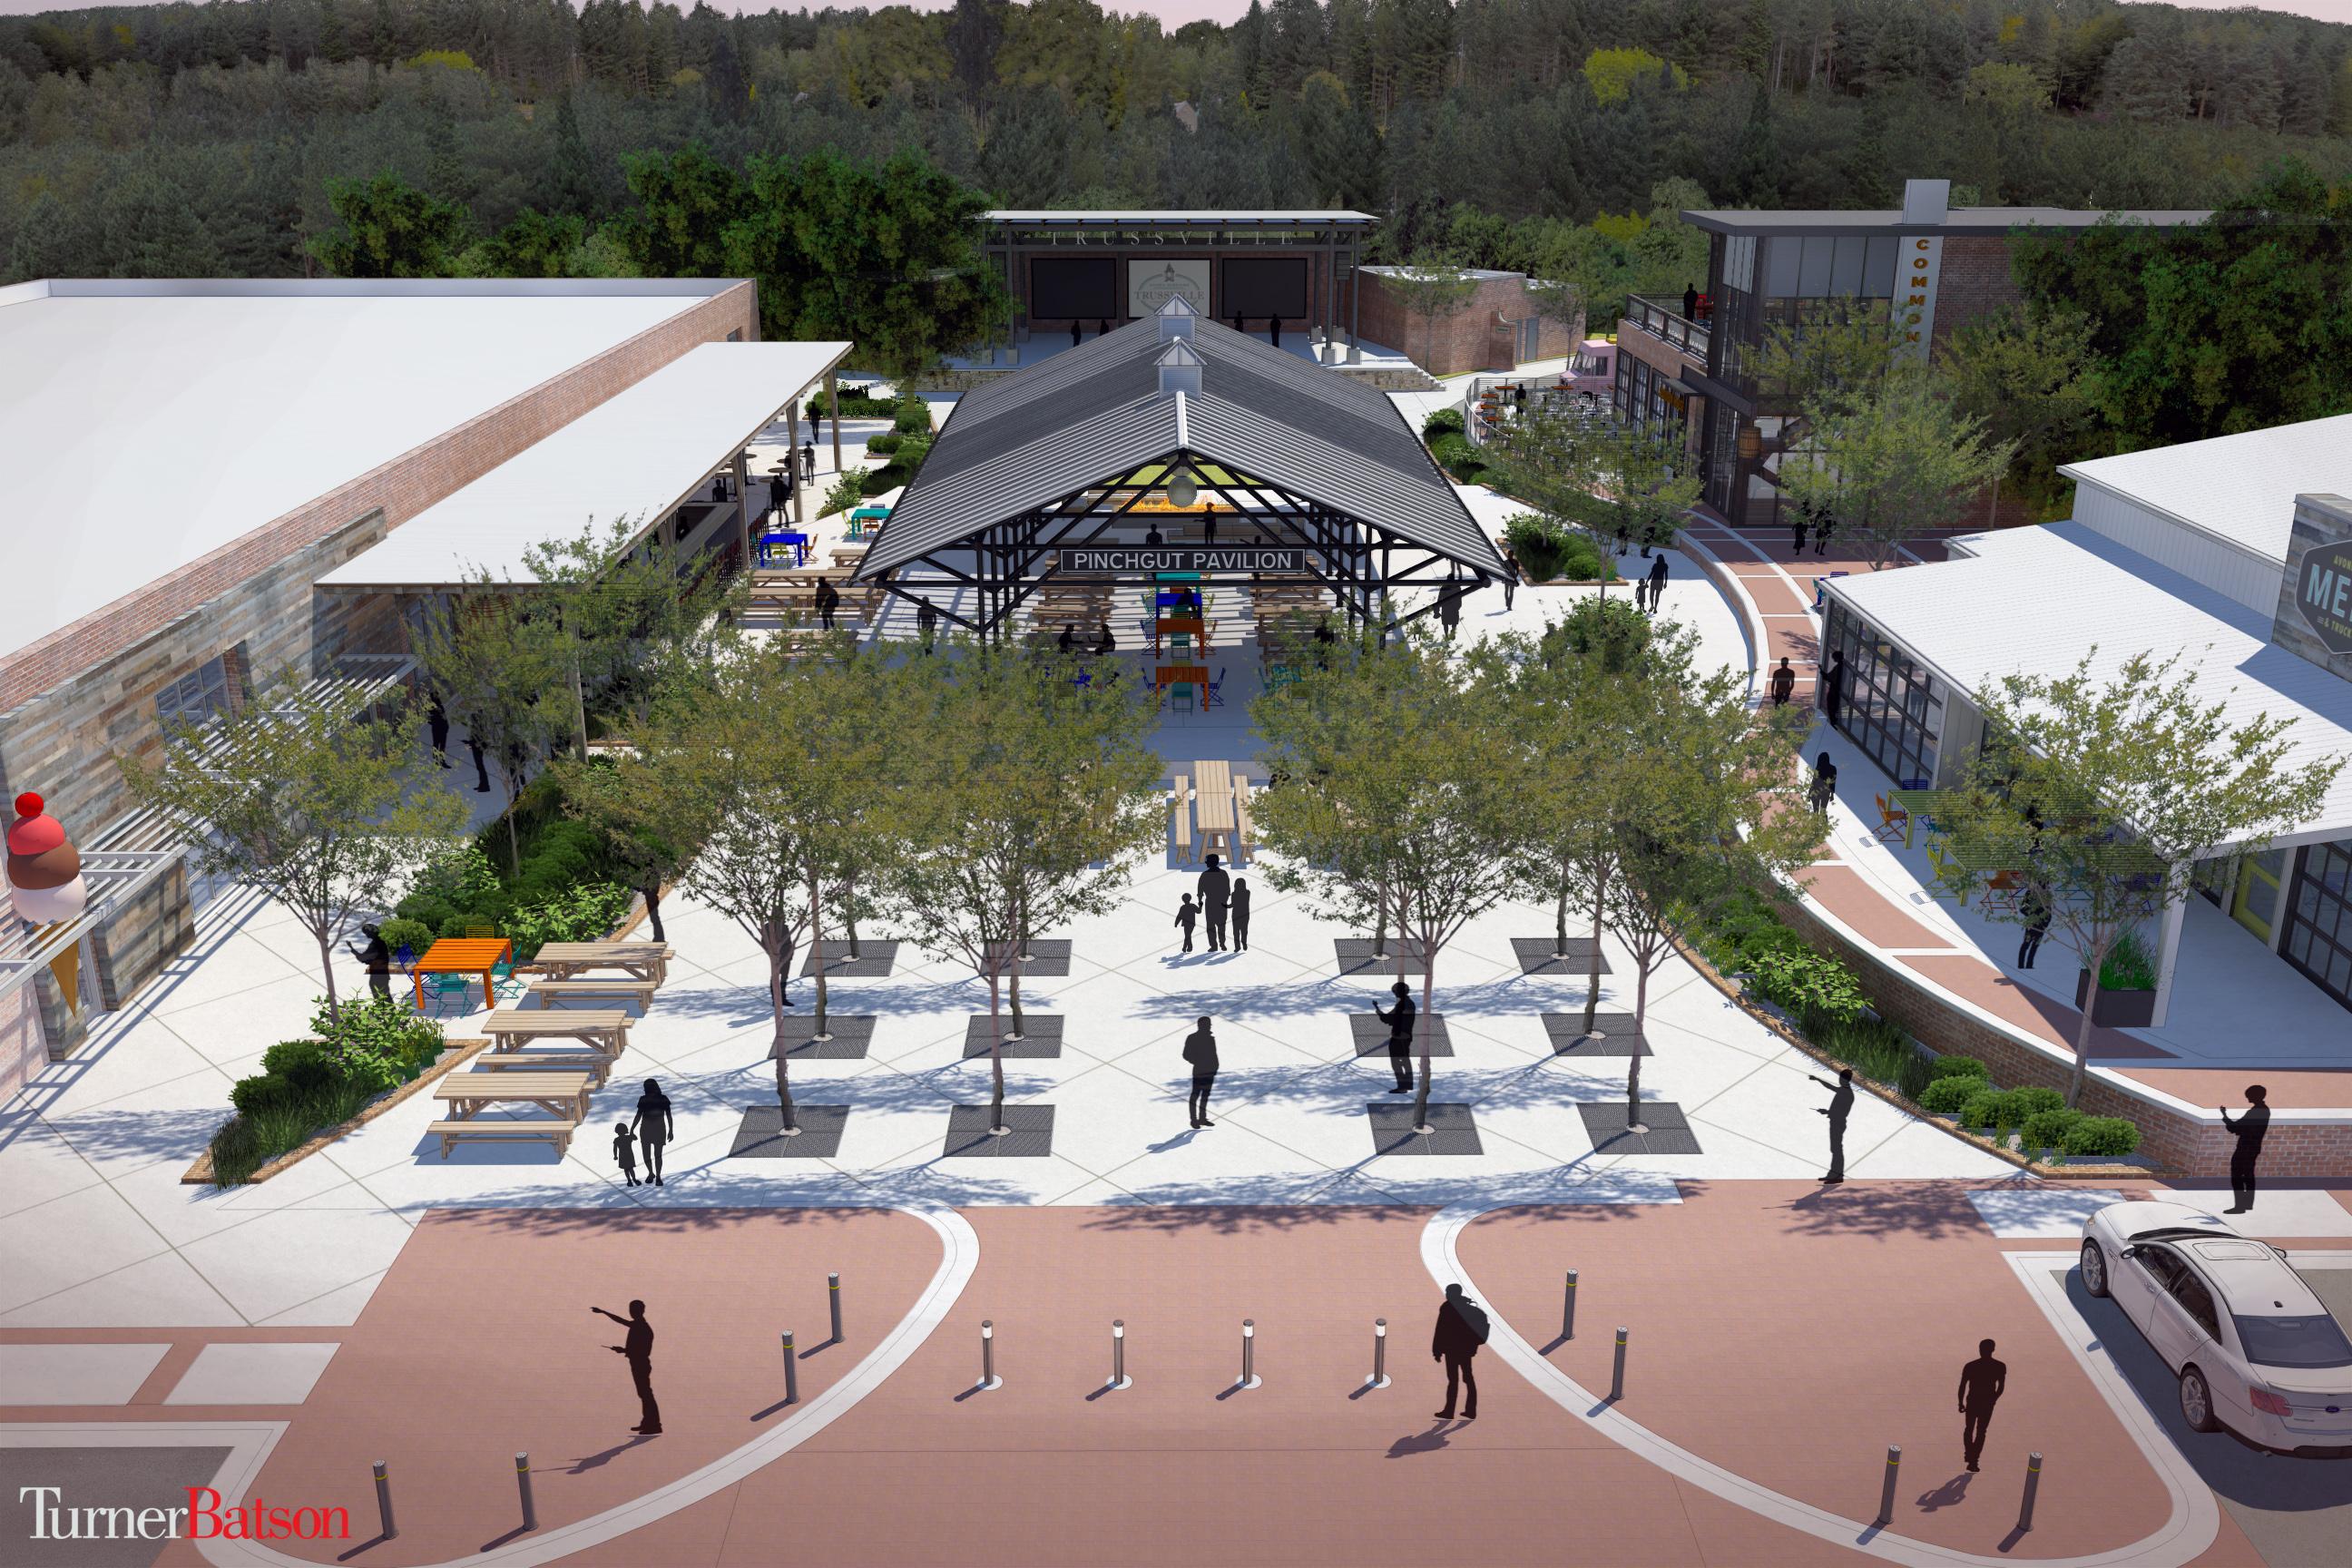 Mayor unveils comprehensive redevelopment plan for Trussville Downtown